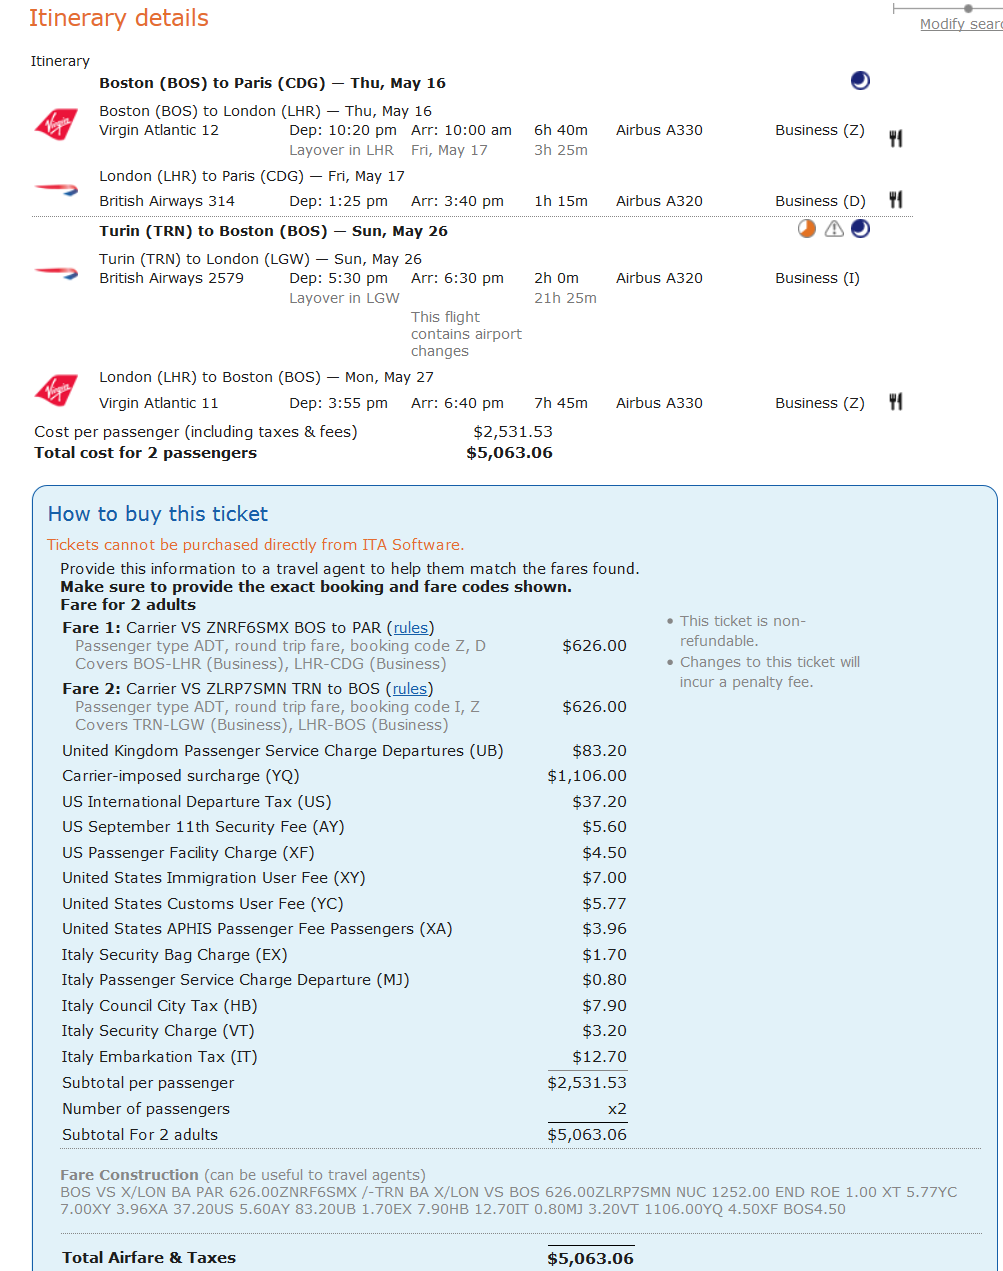 Difficulty booking Virgin/BA itinerary - FlyerTalk Forums